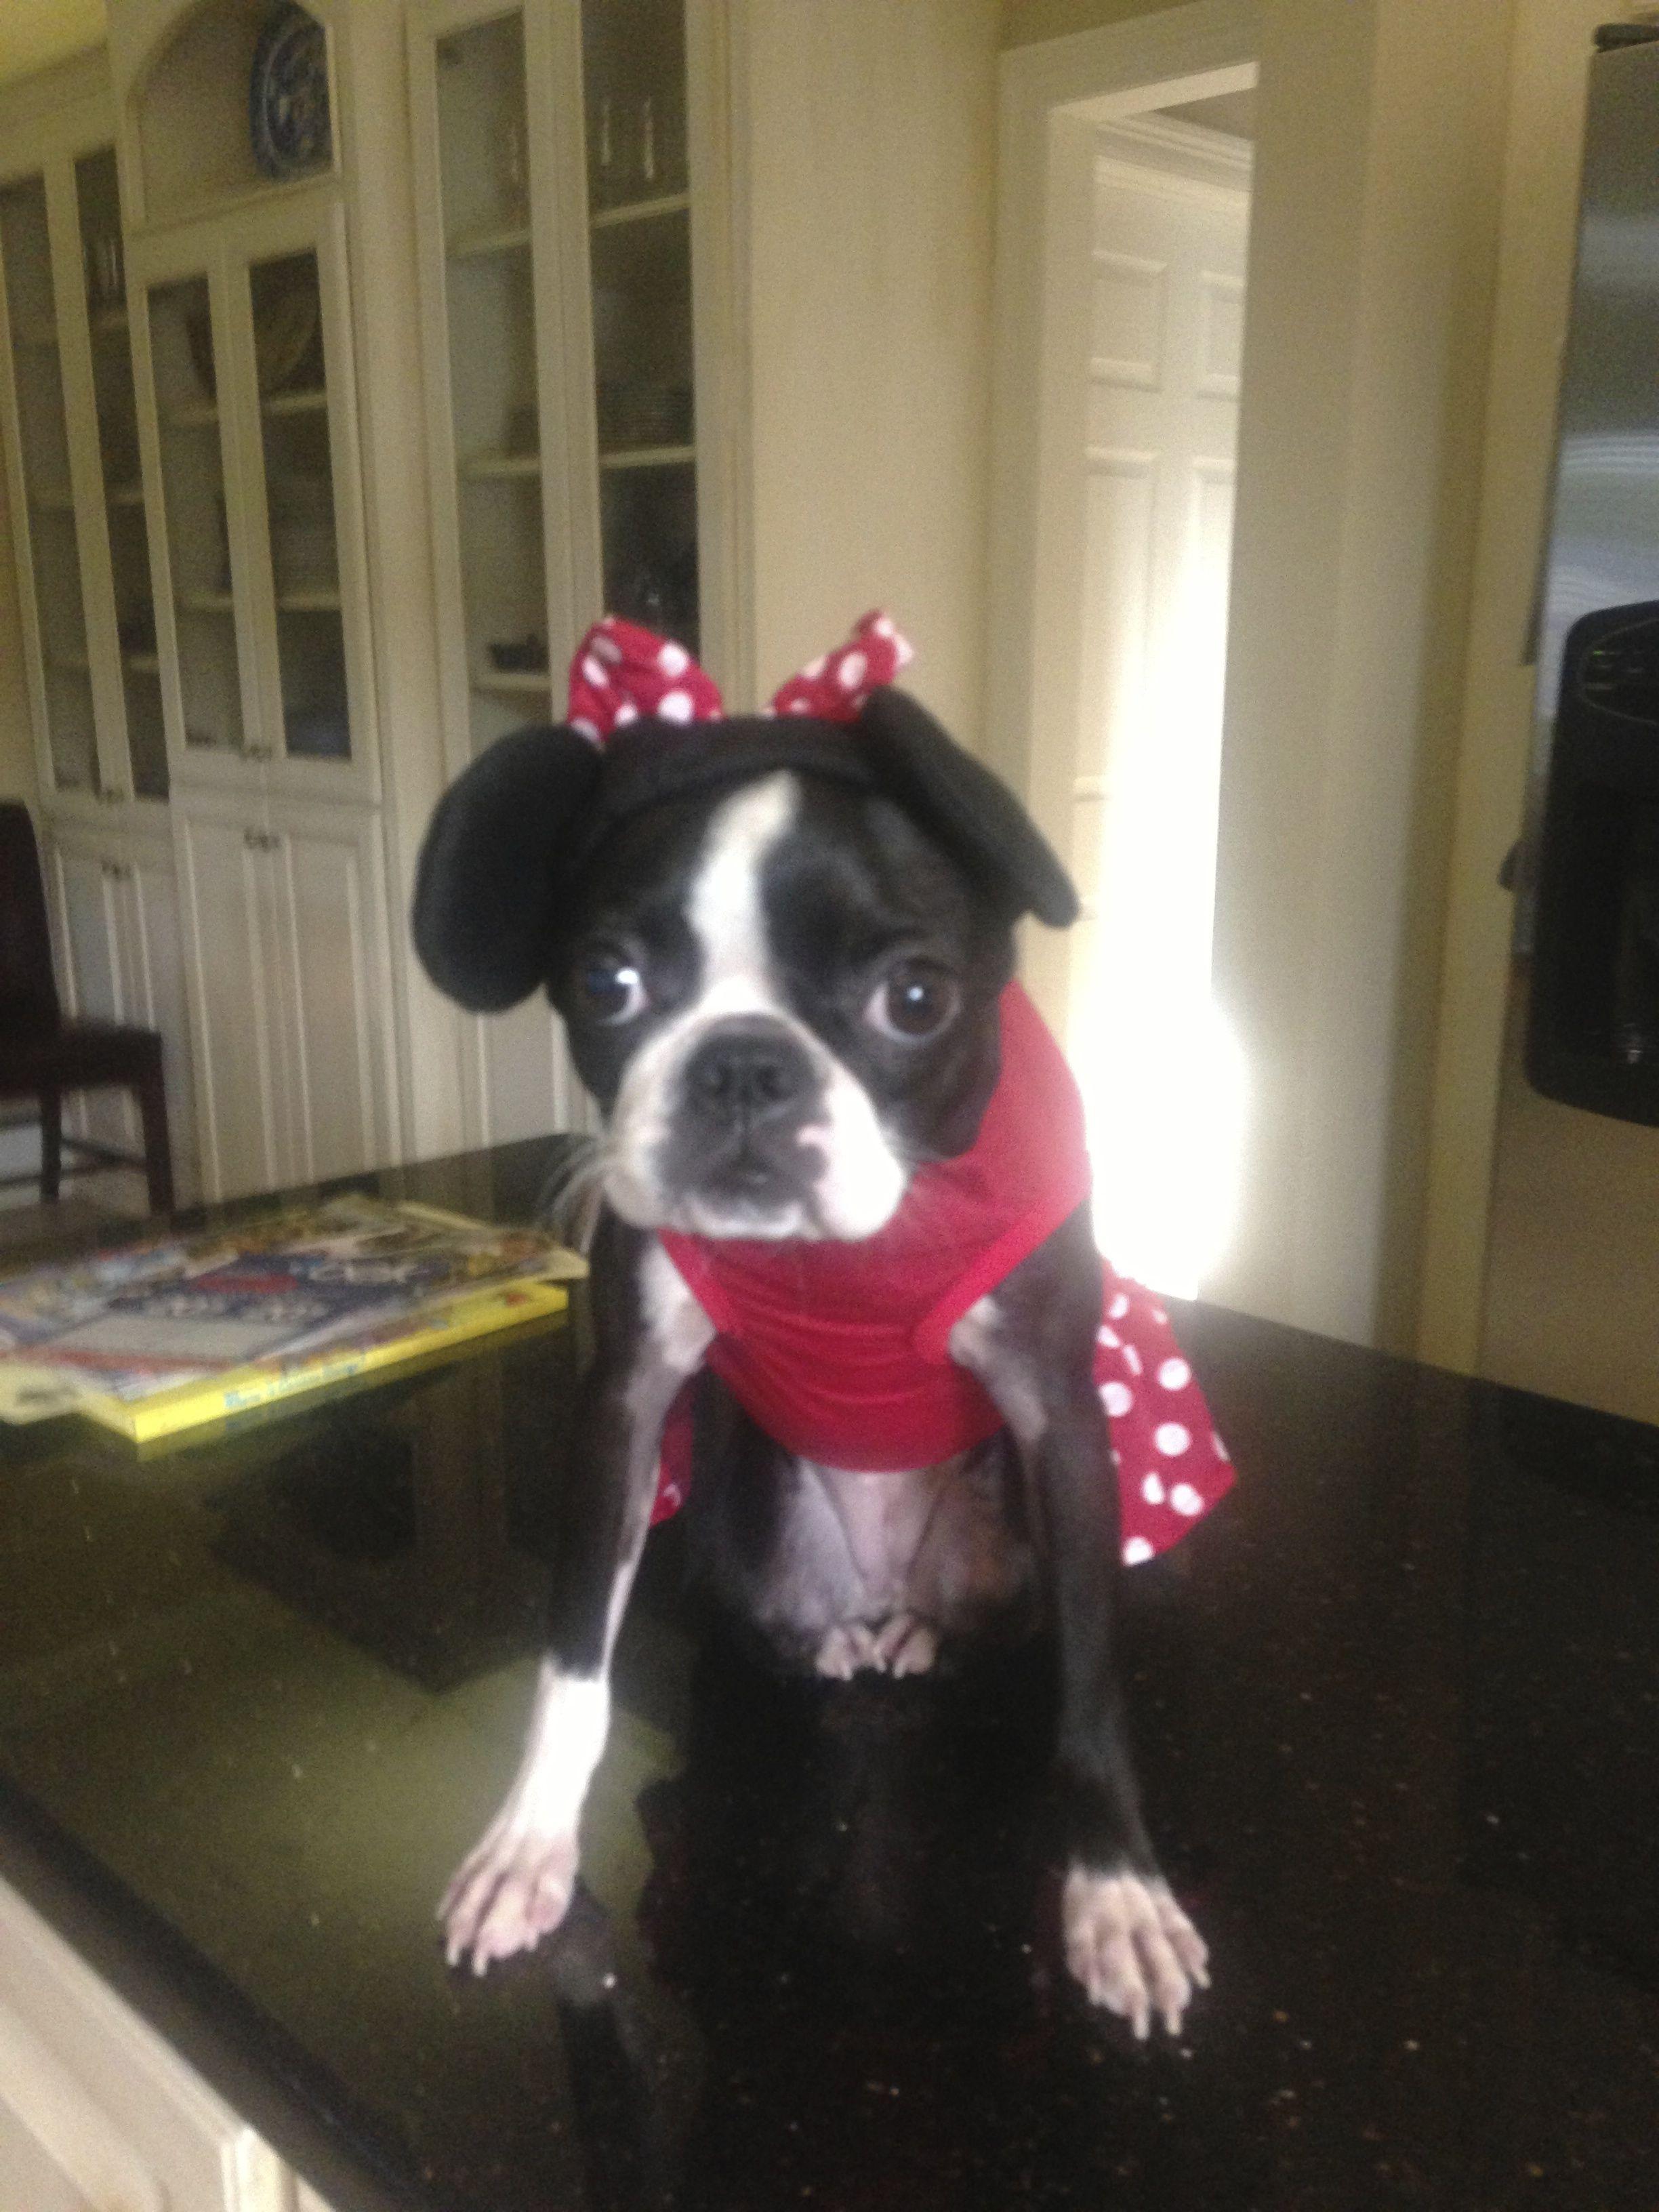 Boston Terrier Costume - Minnie Mouse | Boston Terrors I ...